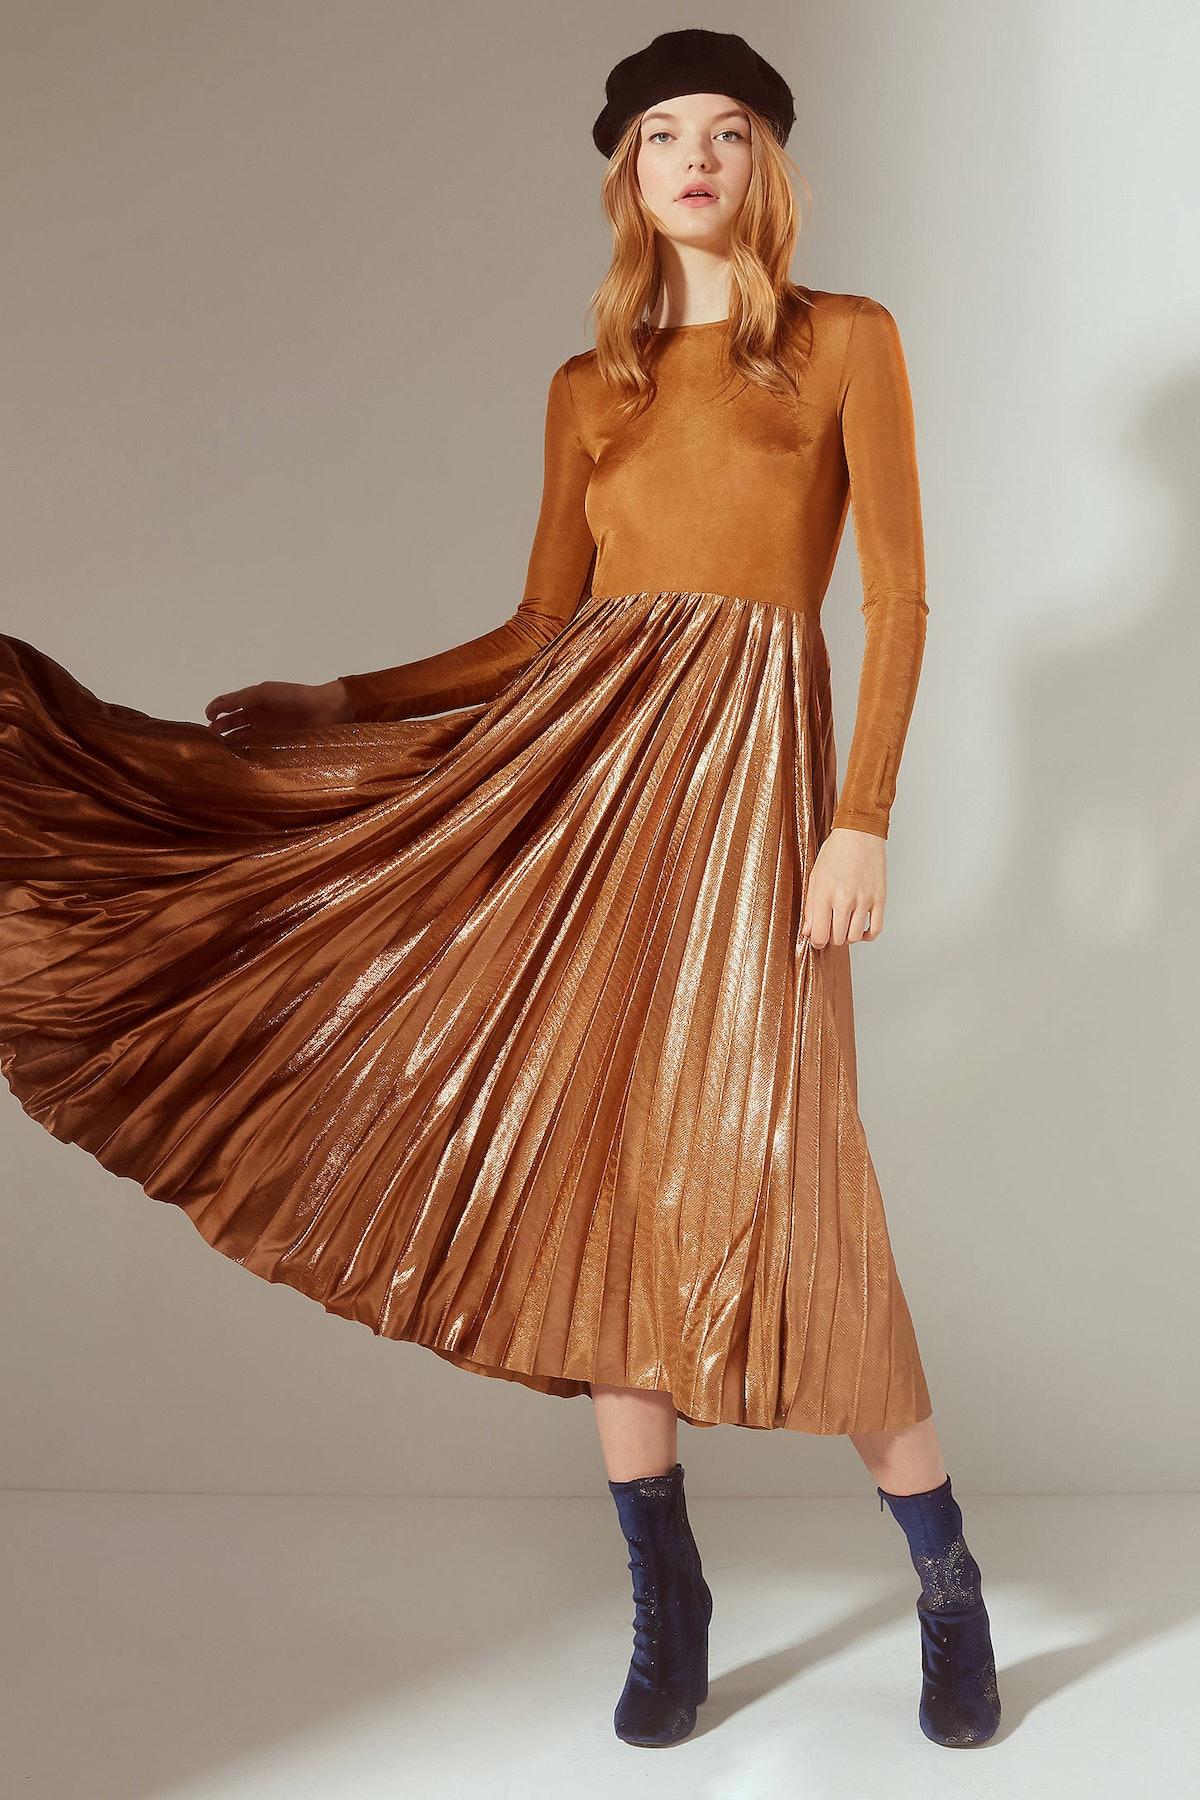 UO Gold Rush Pleated Metallic Midi Dress